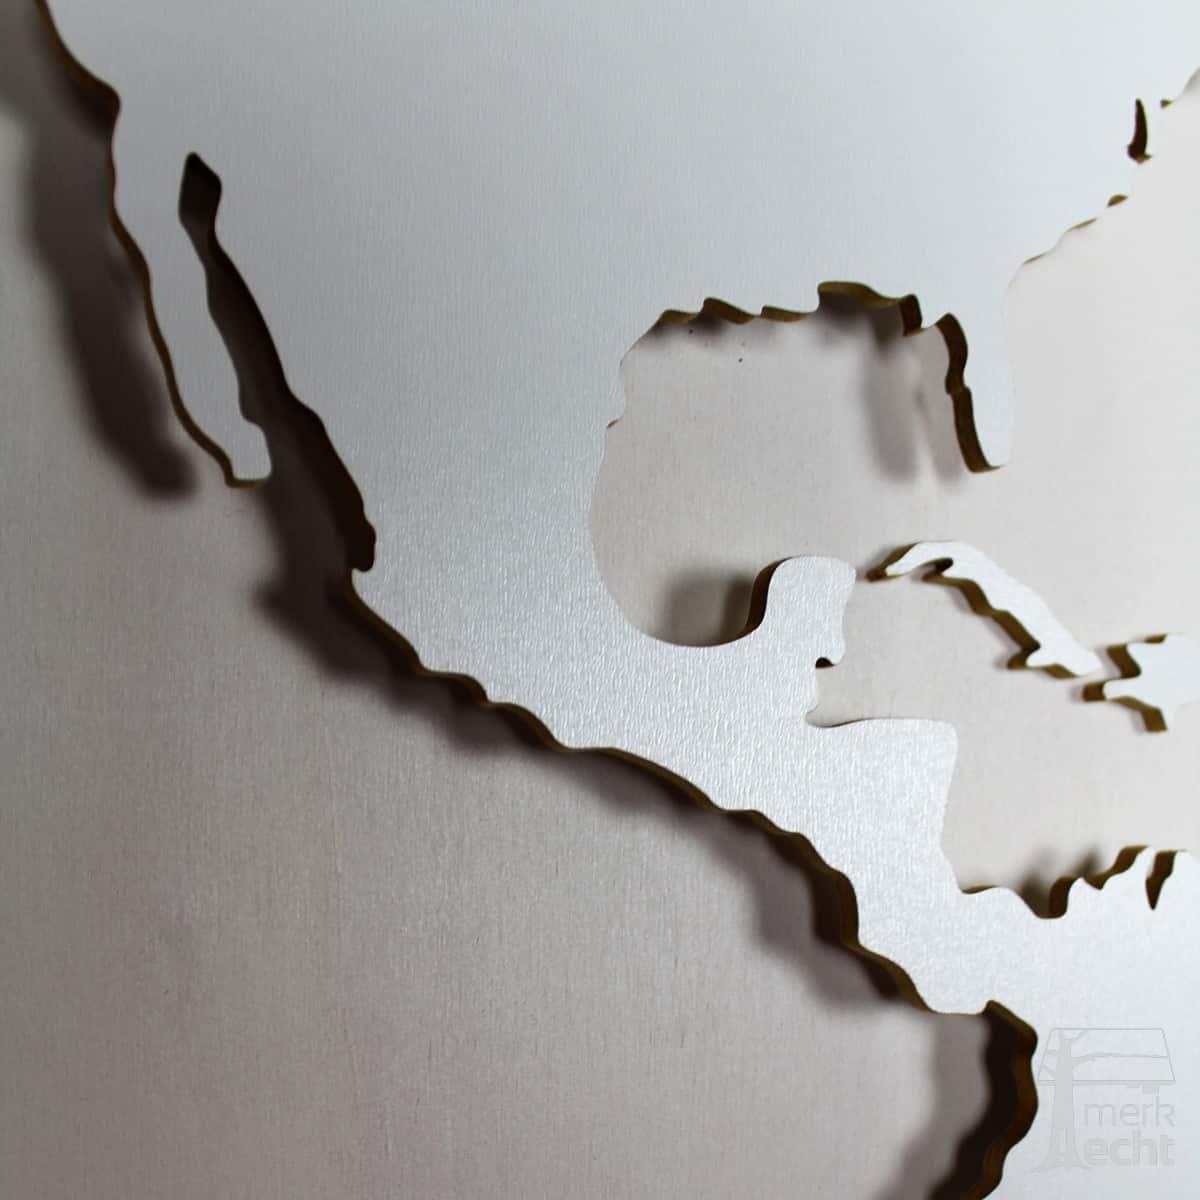 Weltkarte-Birke-Dekor-WeltkarteHolz-Wandbild-Beleuchtet-WeißesKontinente-Holz-Welt-Karte-XXL-WelkartenAusHolz-WeißeKontinente-KontinenteHolz